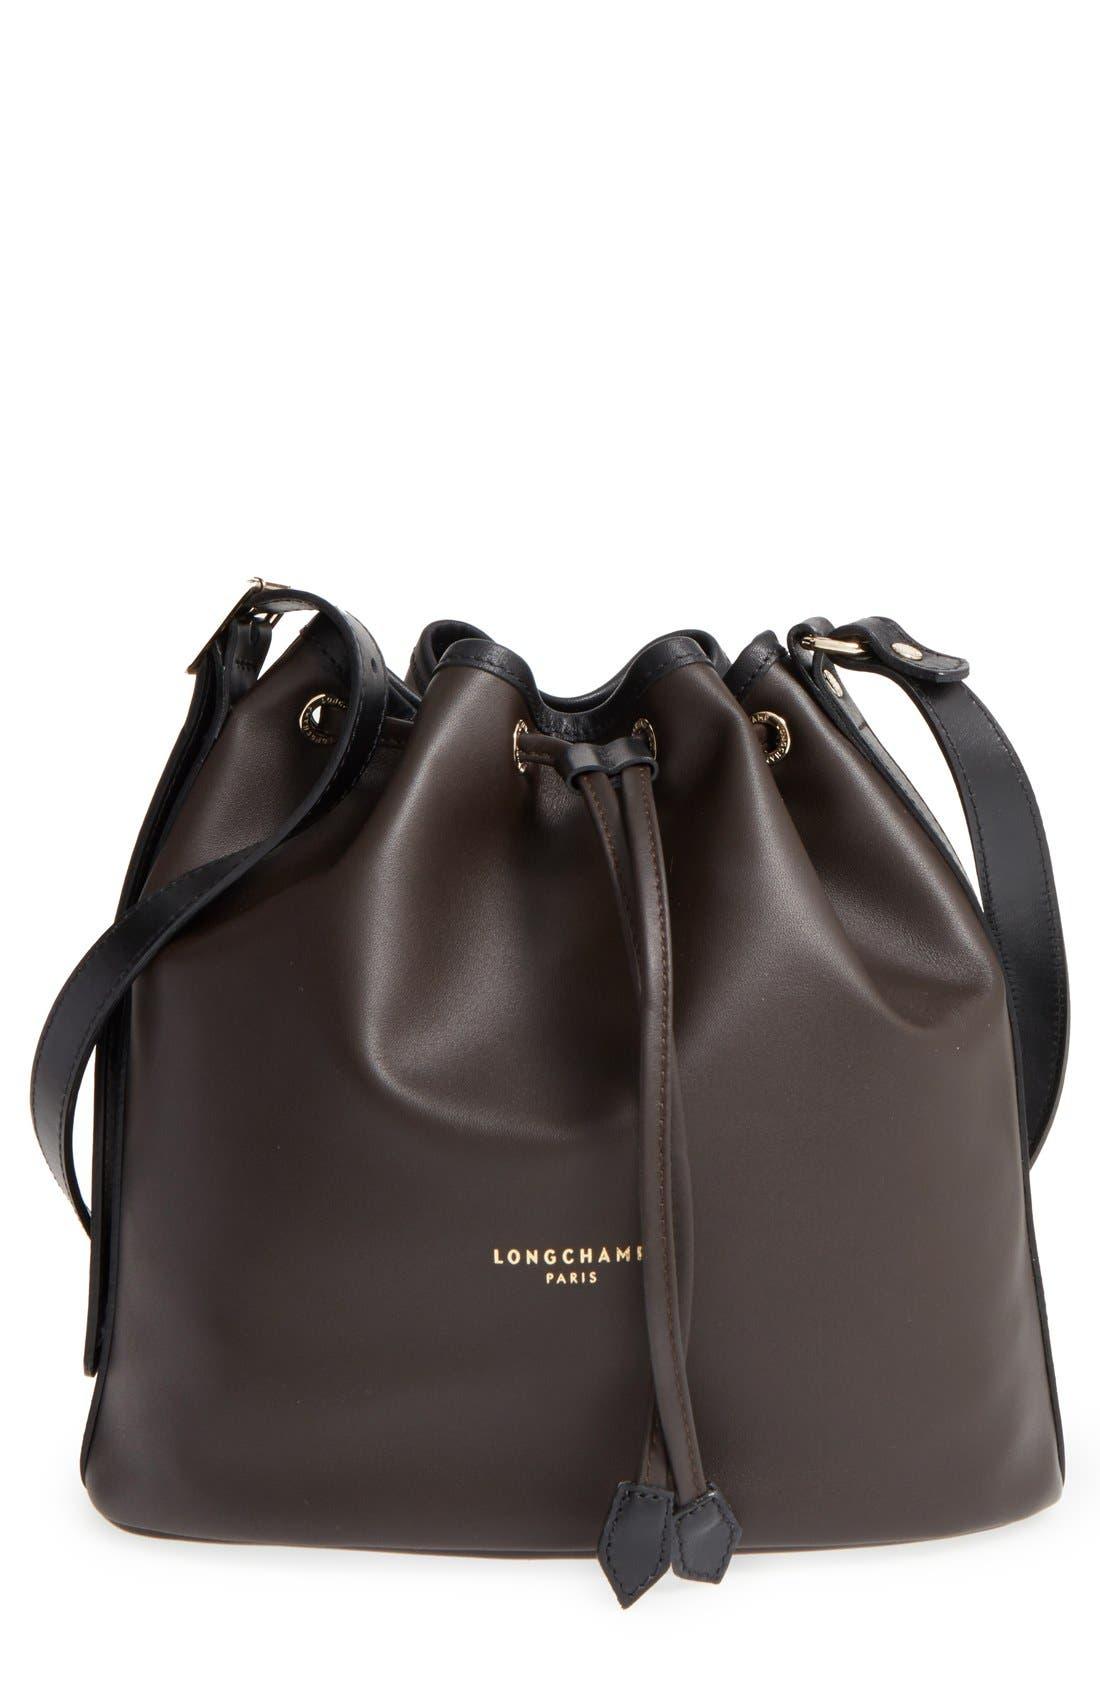 Alternate Image 1 Selected - Longchamp 'Small 2.0' Leather Bucket Bag